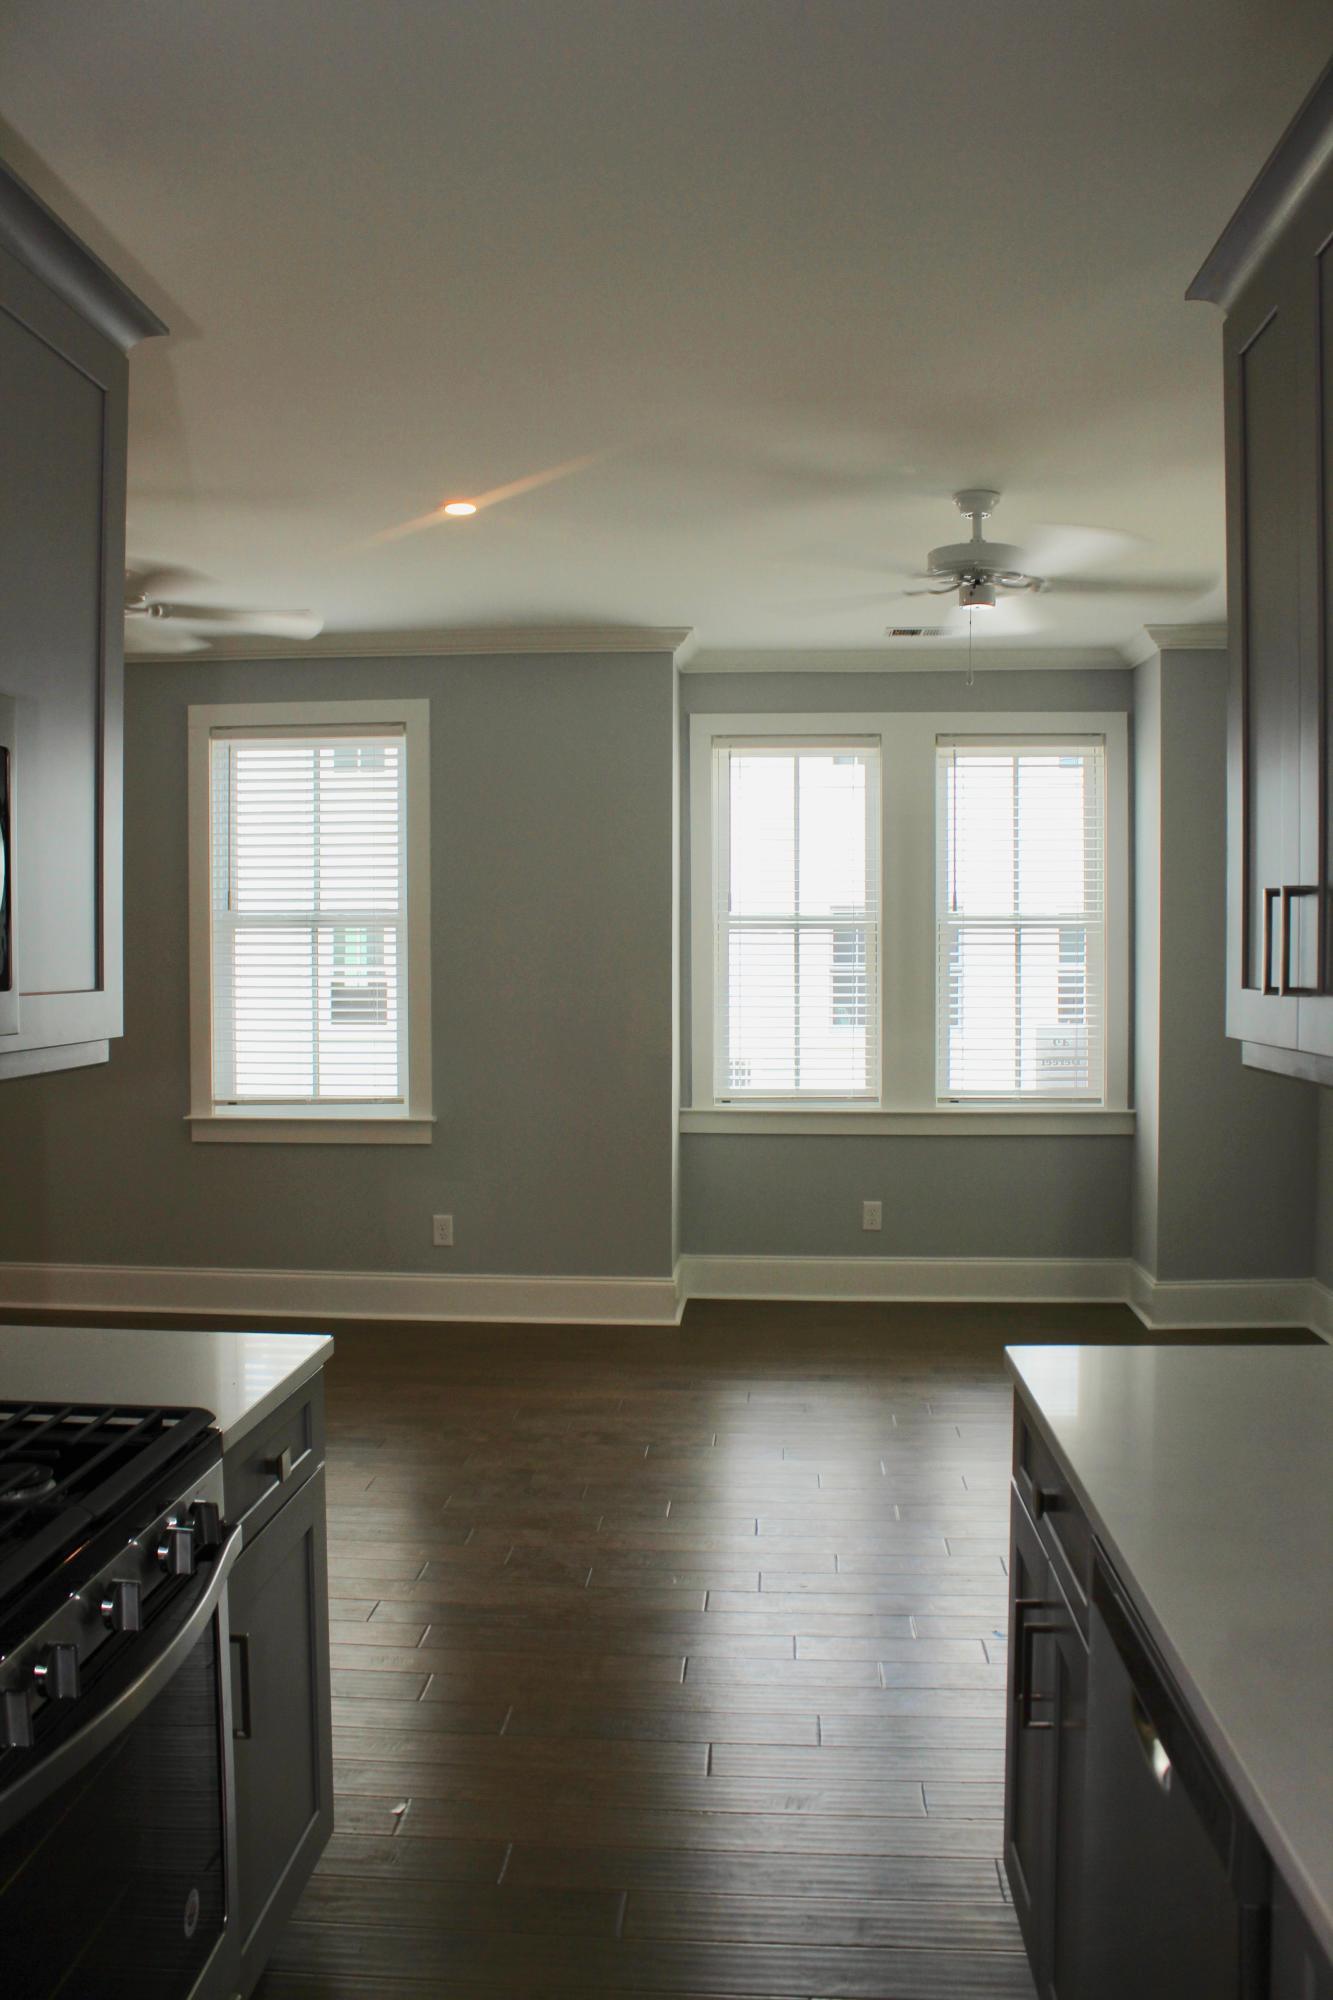 Morris Square Homes For Sale - 41 Dereef, Charleston, SC - 28